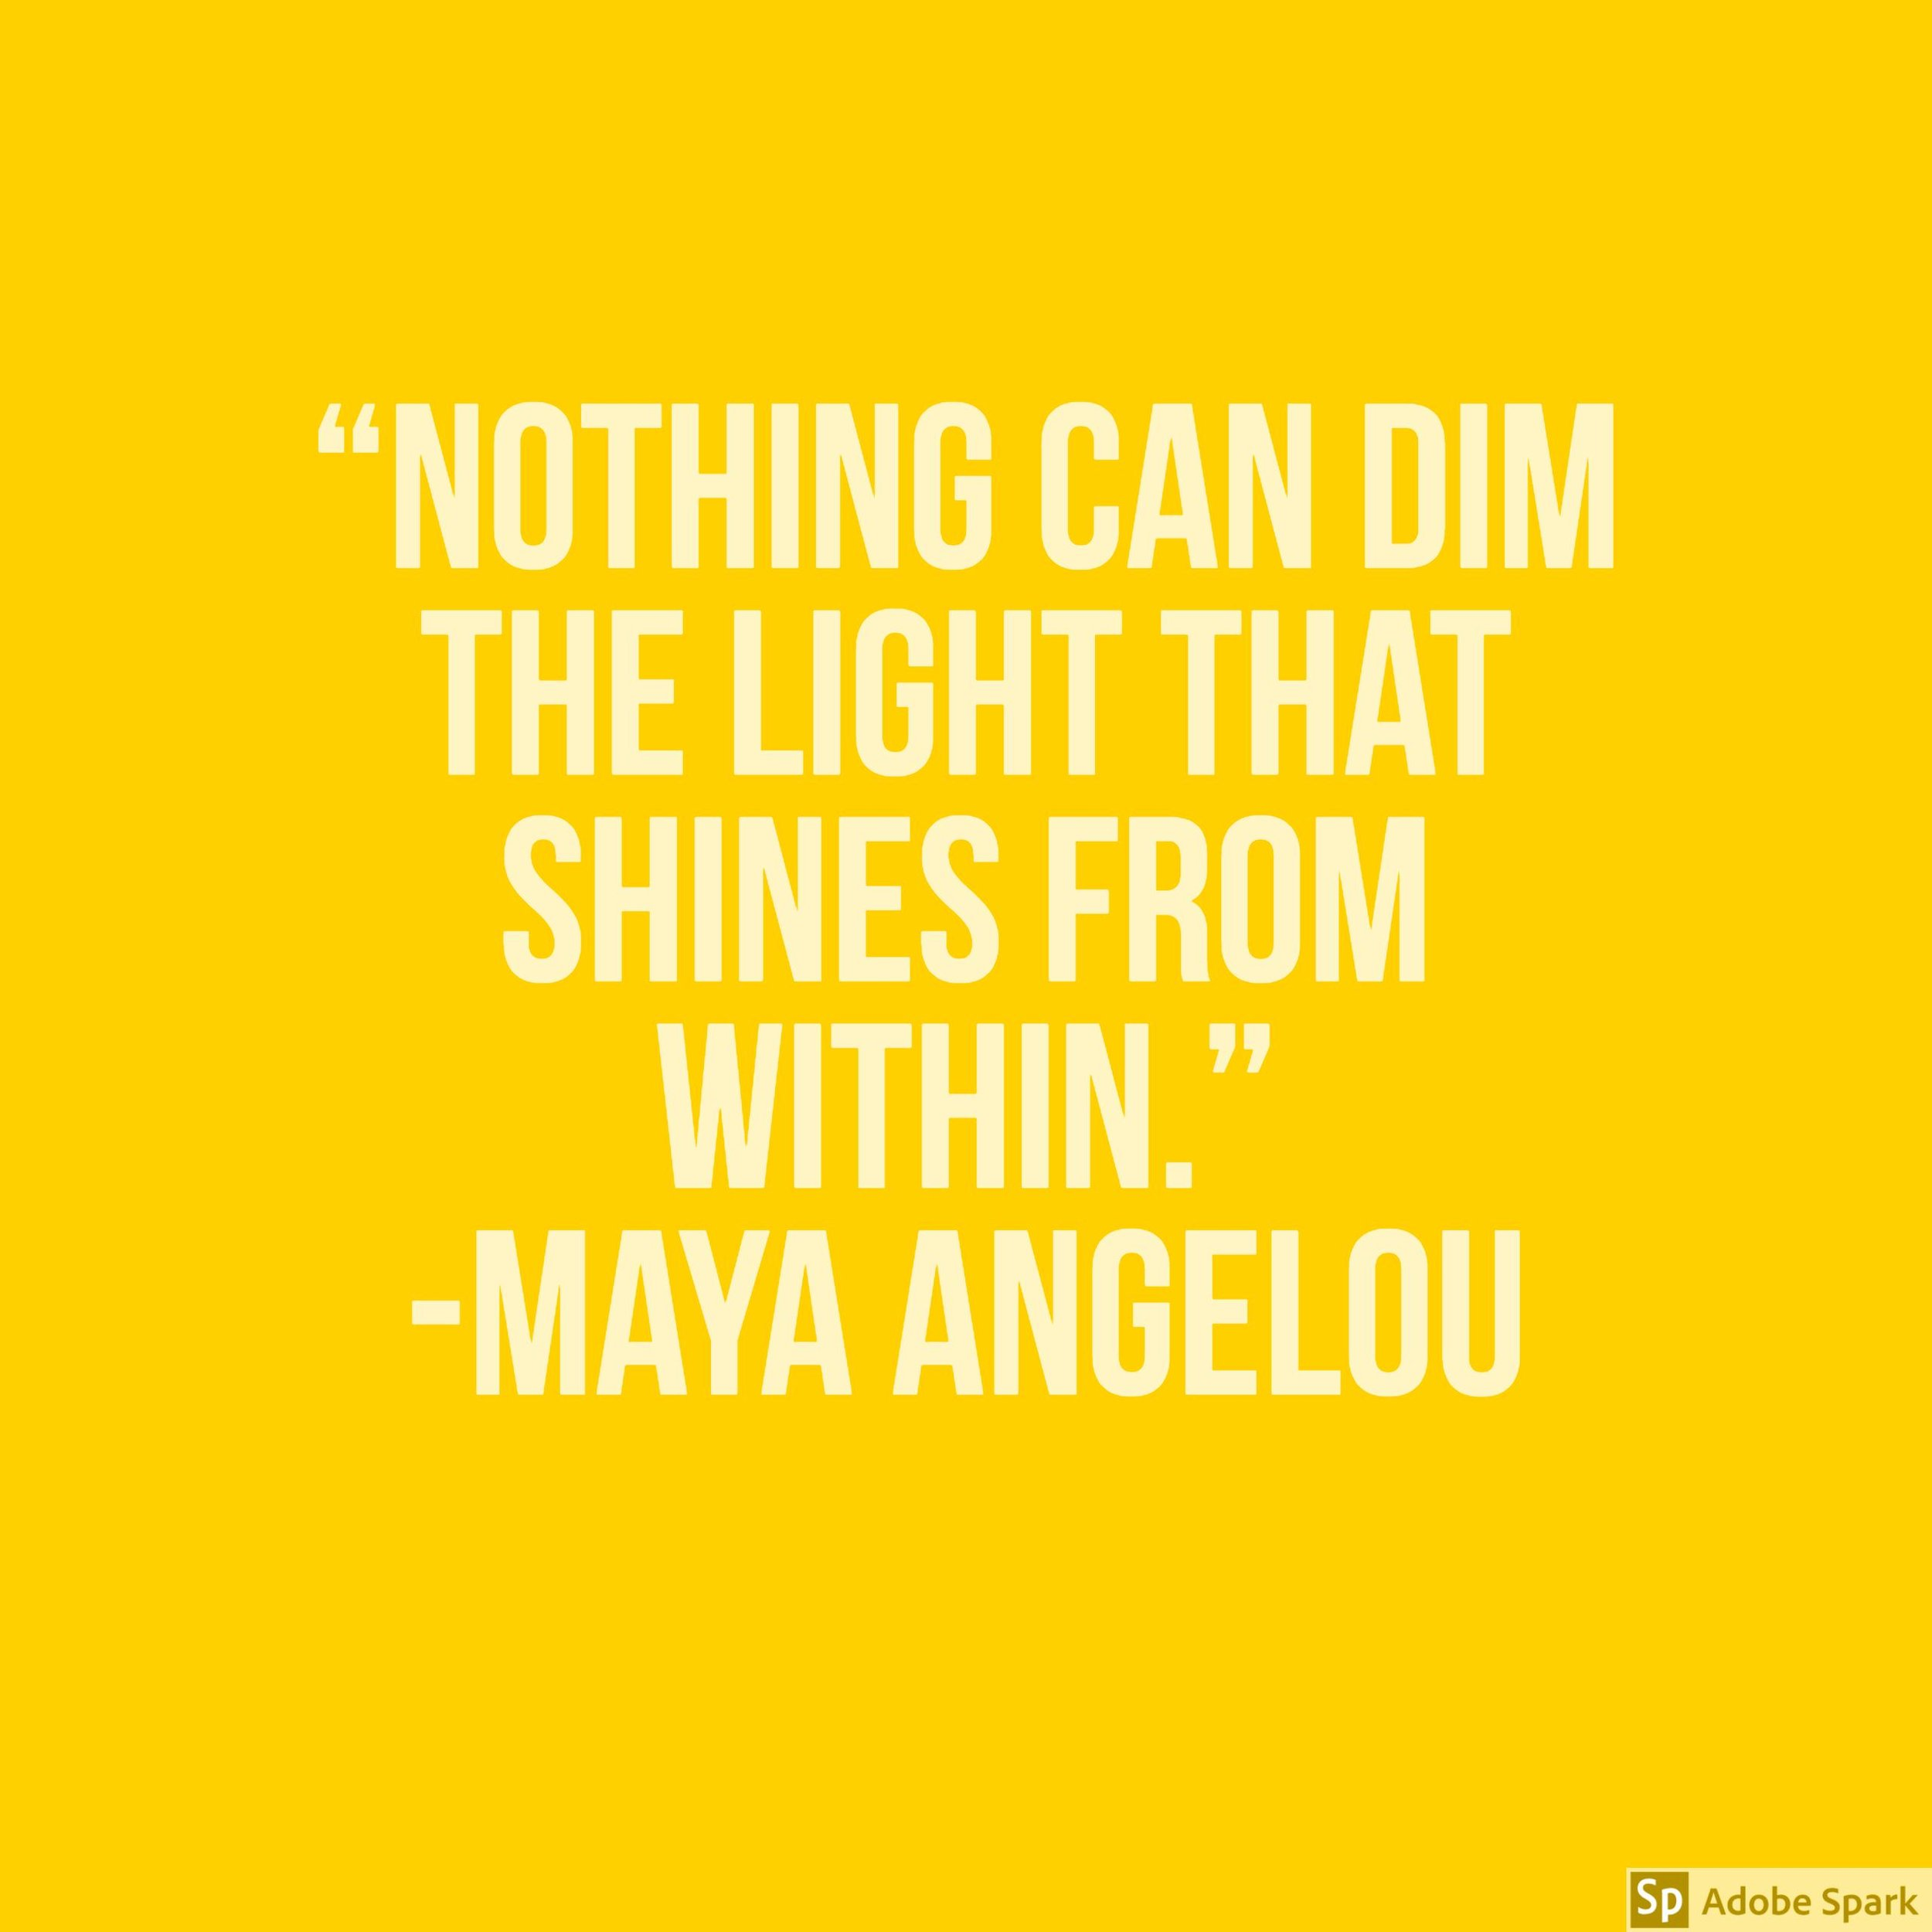 Maya Angelous Quote.jpg